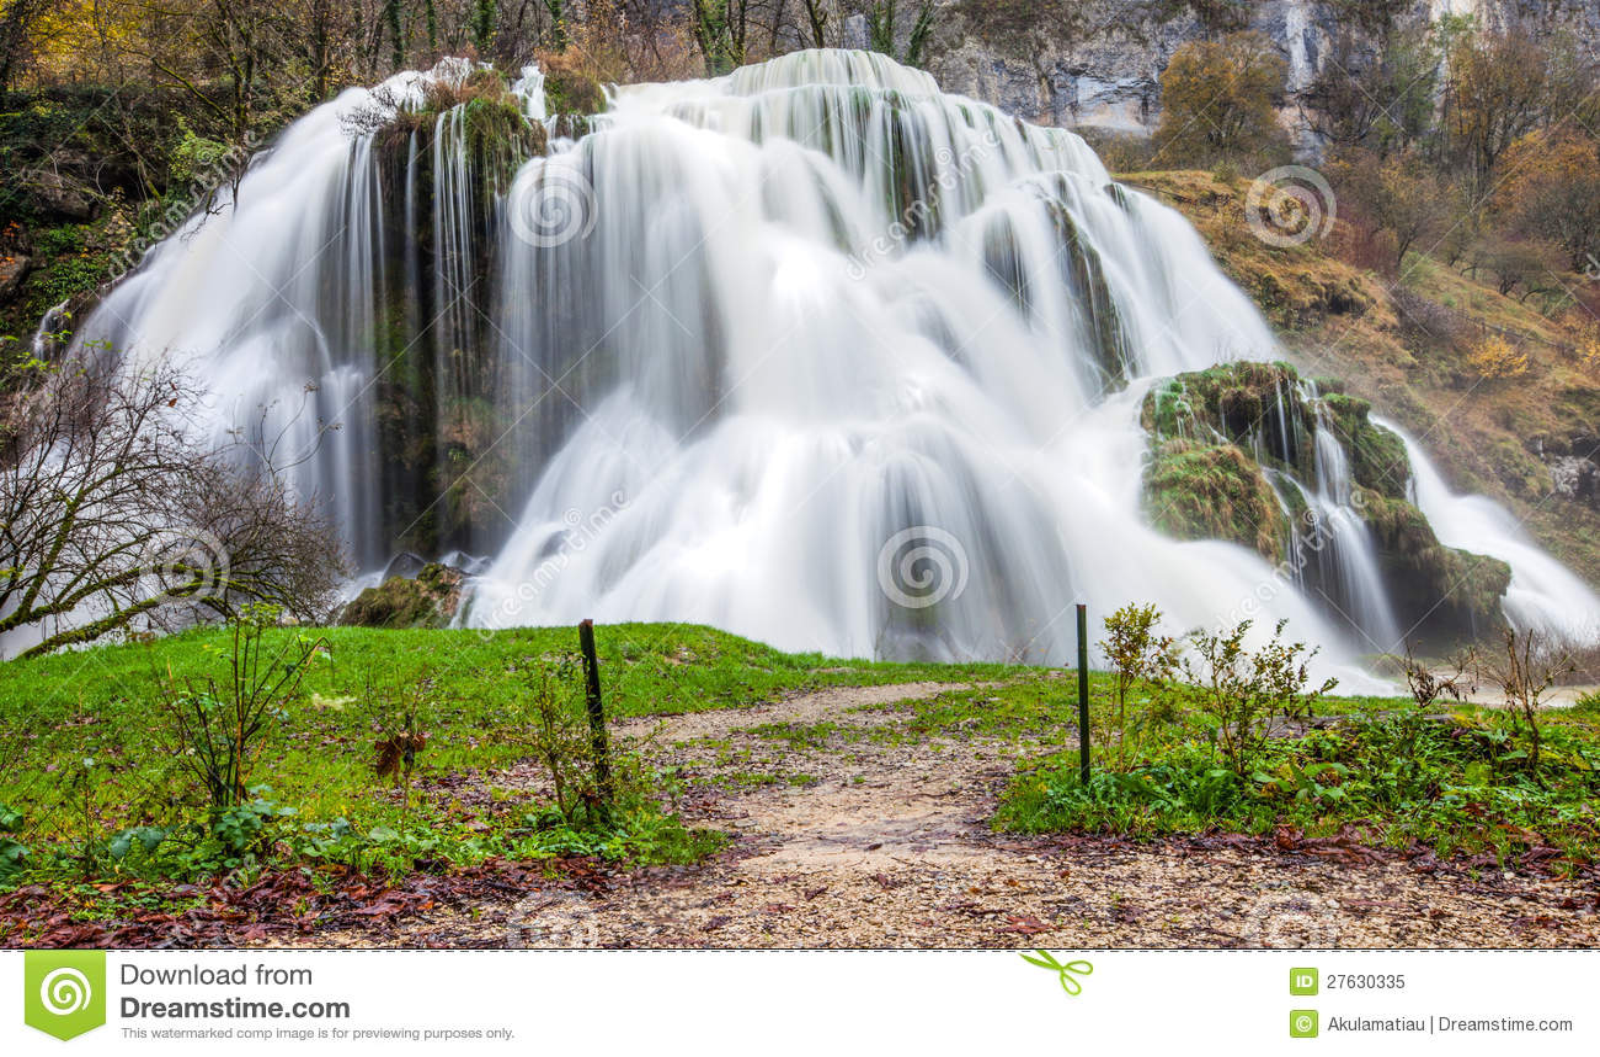 Cascade des Tufs, France